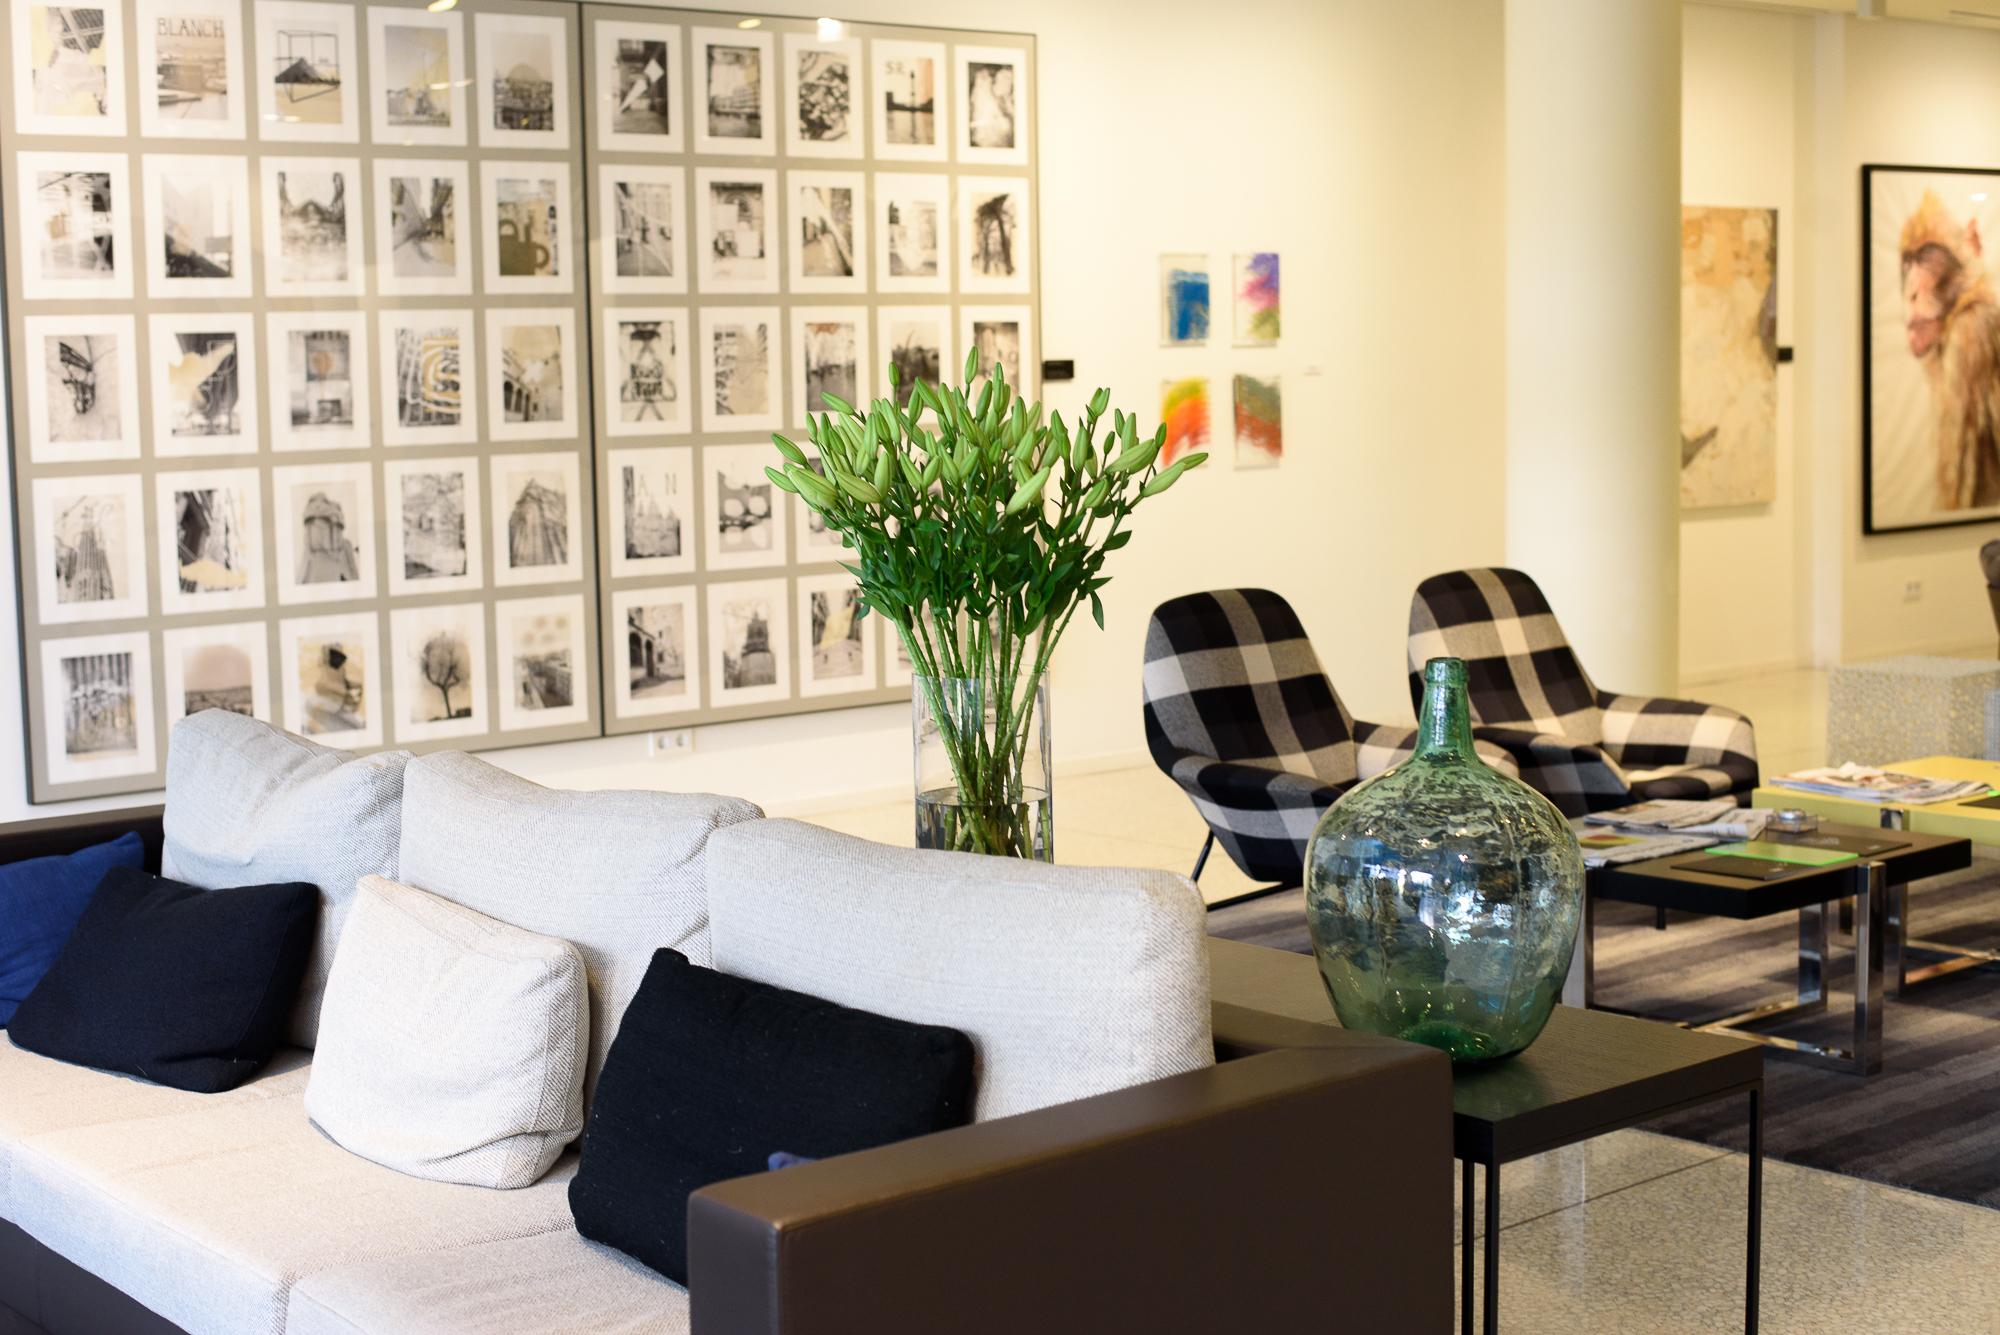 h10-art-gallery-hotel-barcelona-5